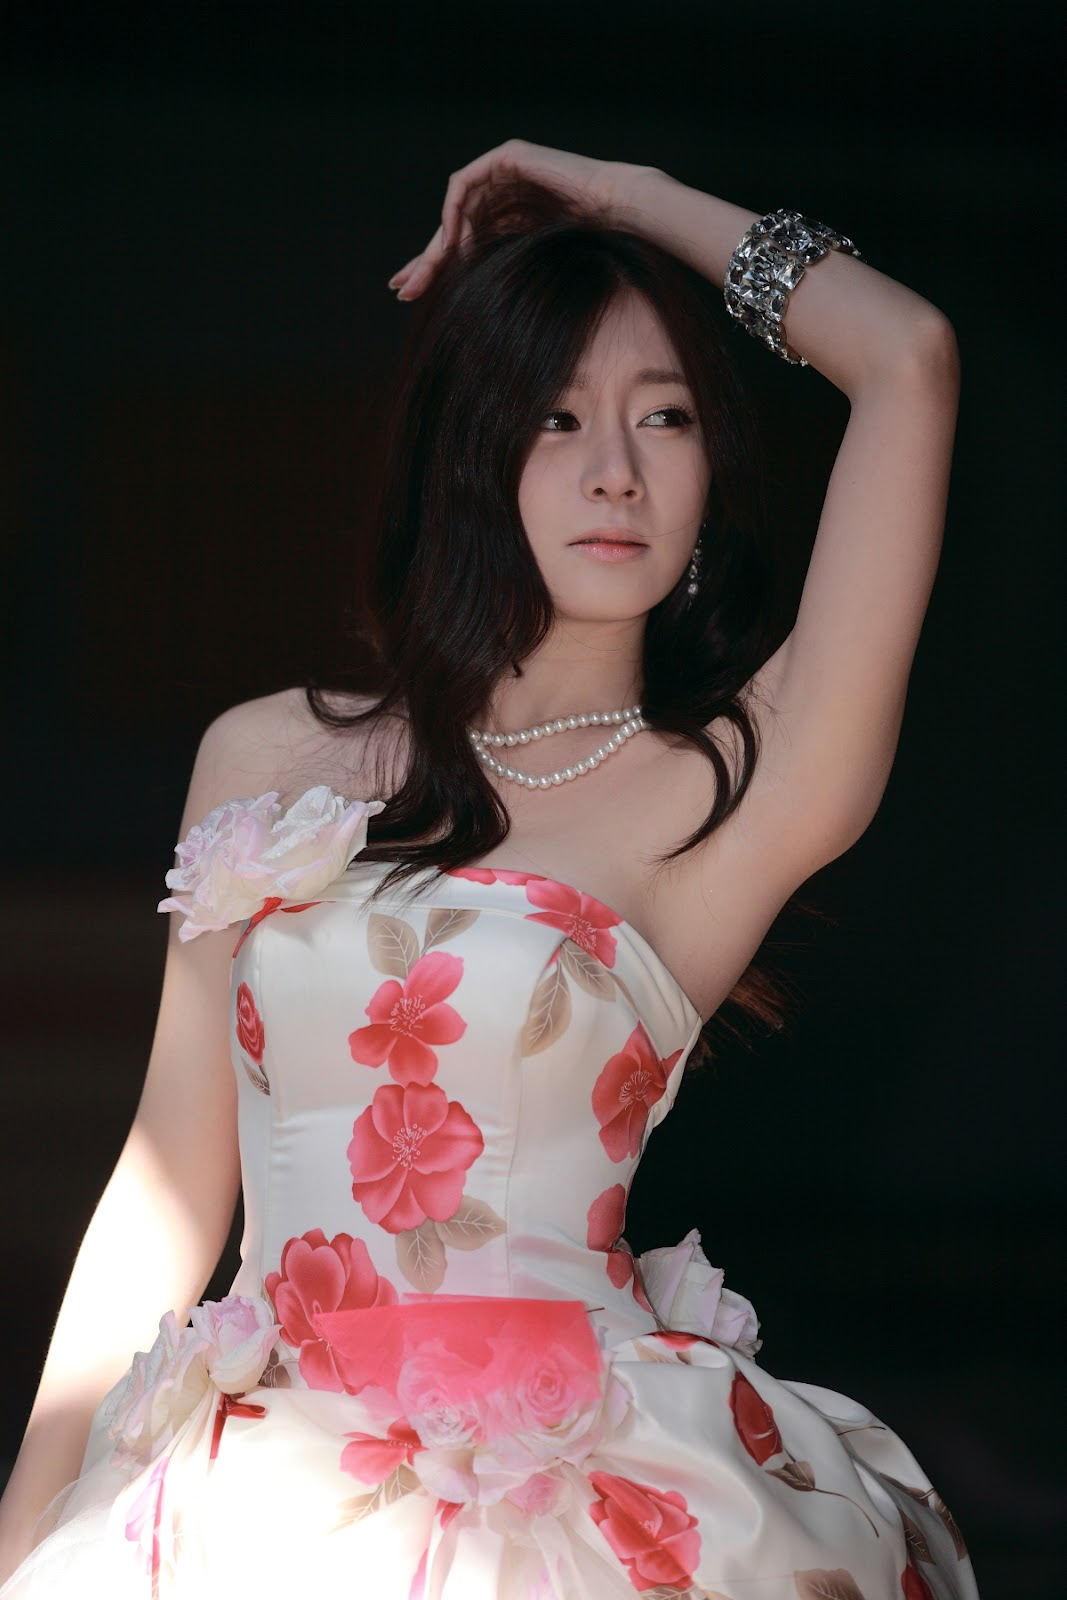 Lee Ji Eun Instagram - Image 4 FAP